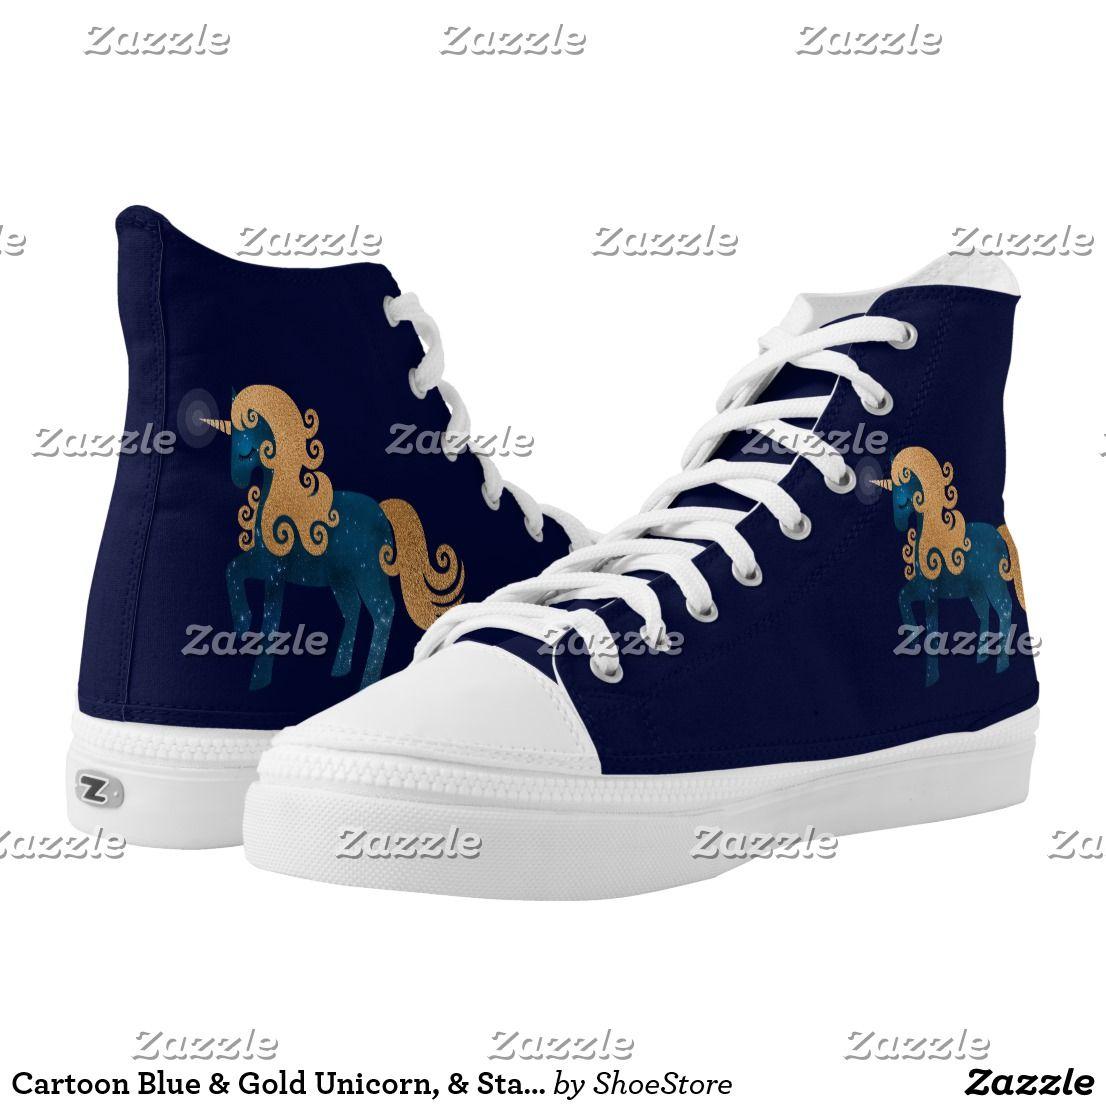 Cartoon Blue & Gold Unicorn, & Stars High Top Shoe | Top